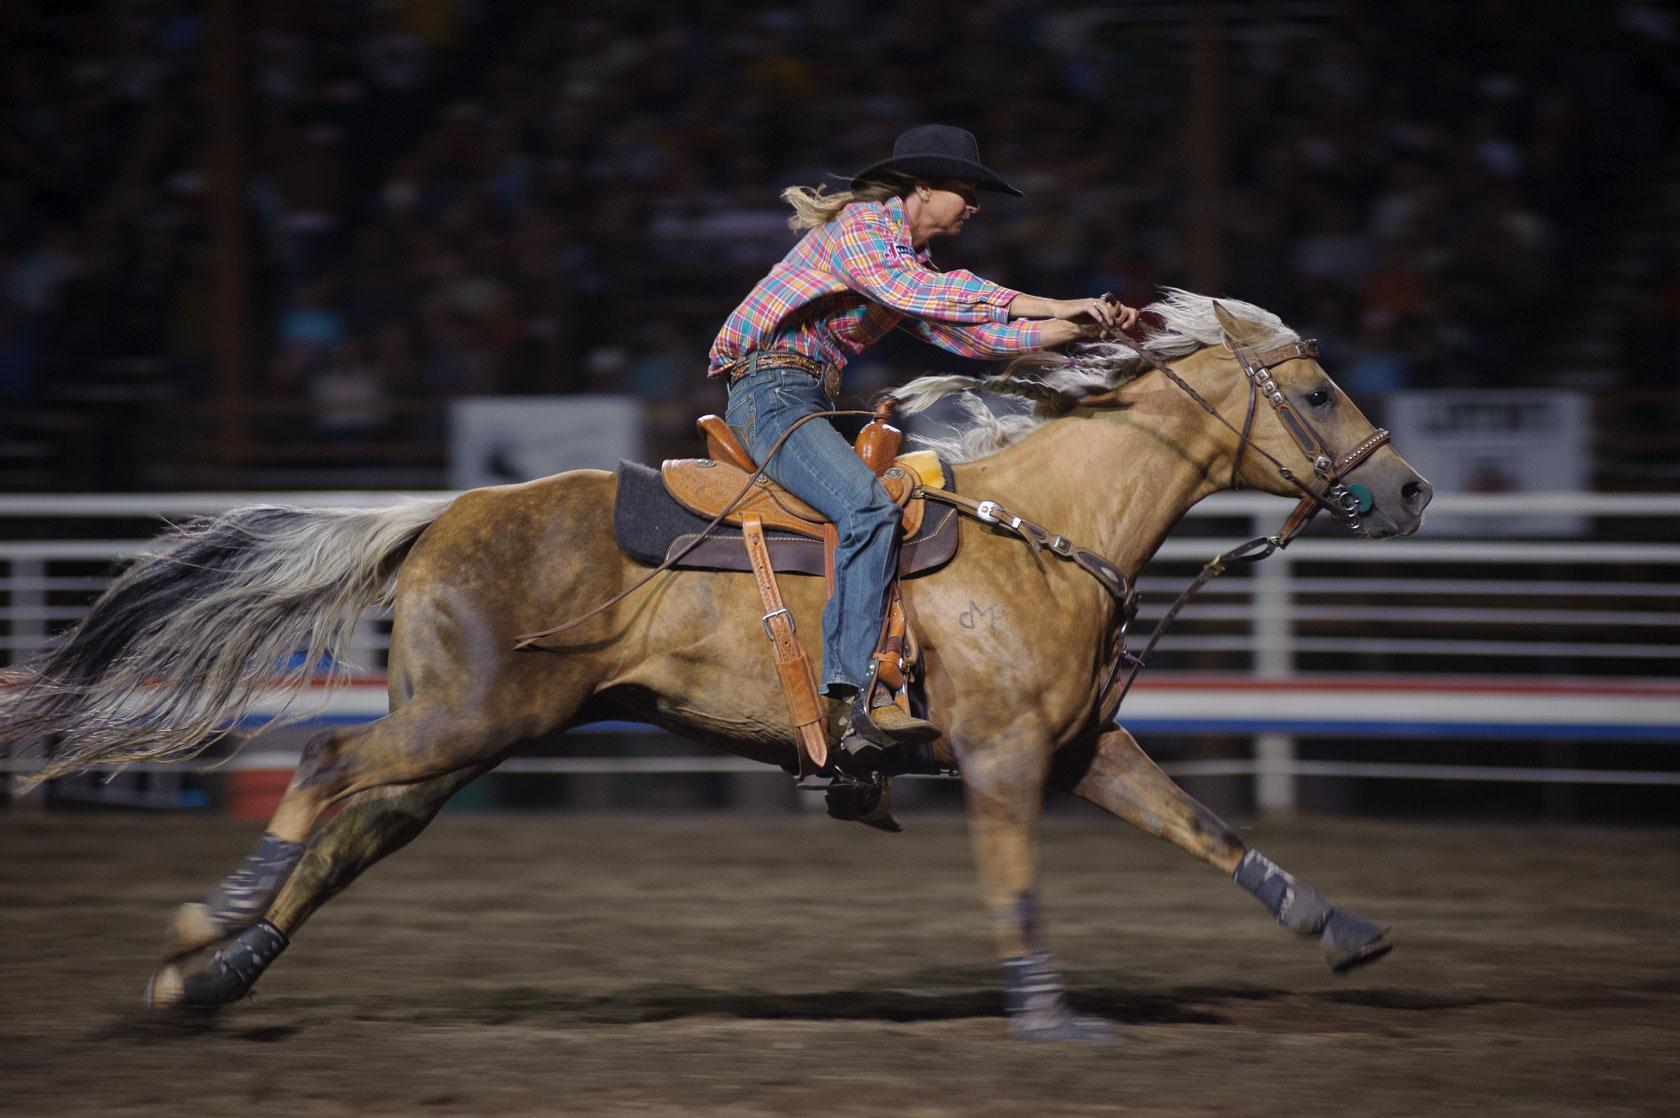 Barrel Racer, Cody Night Rodeo, Wyoming